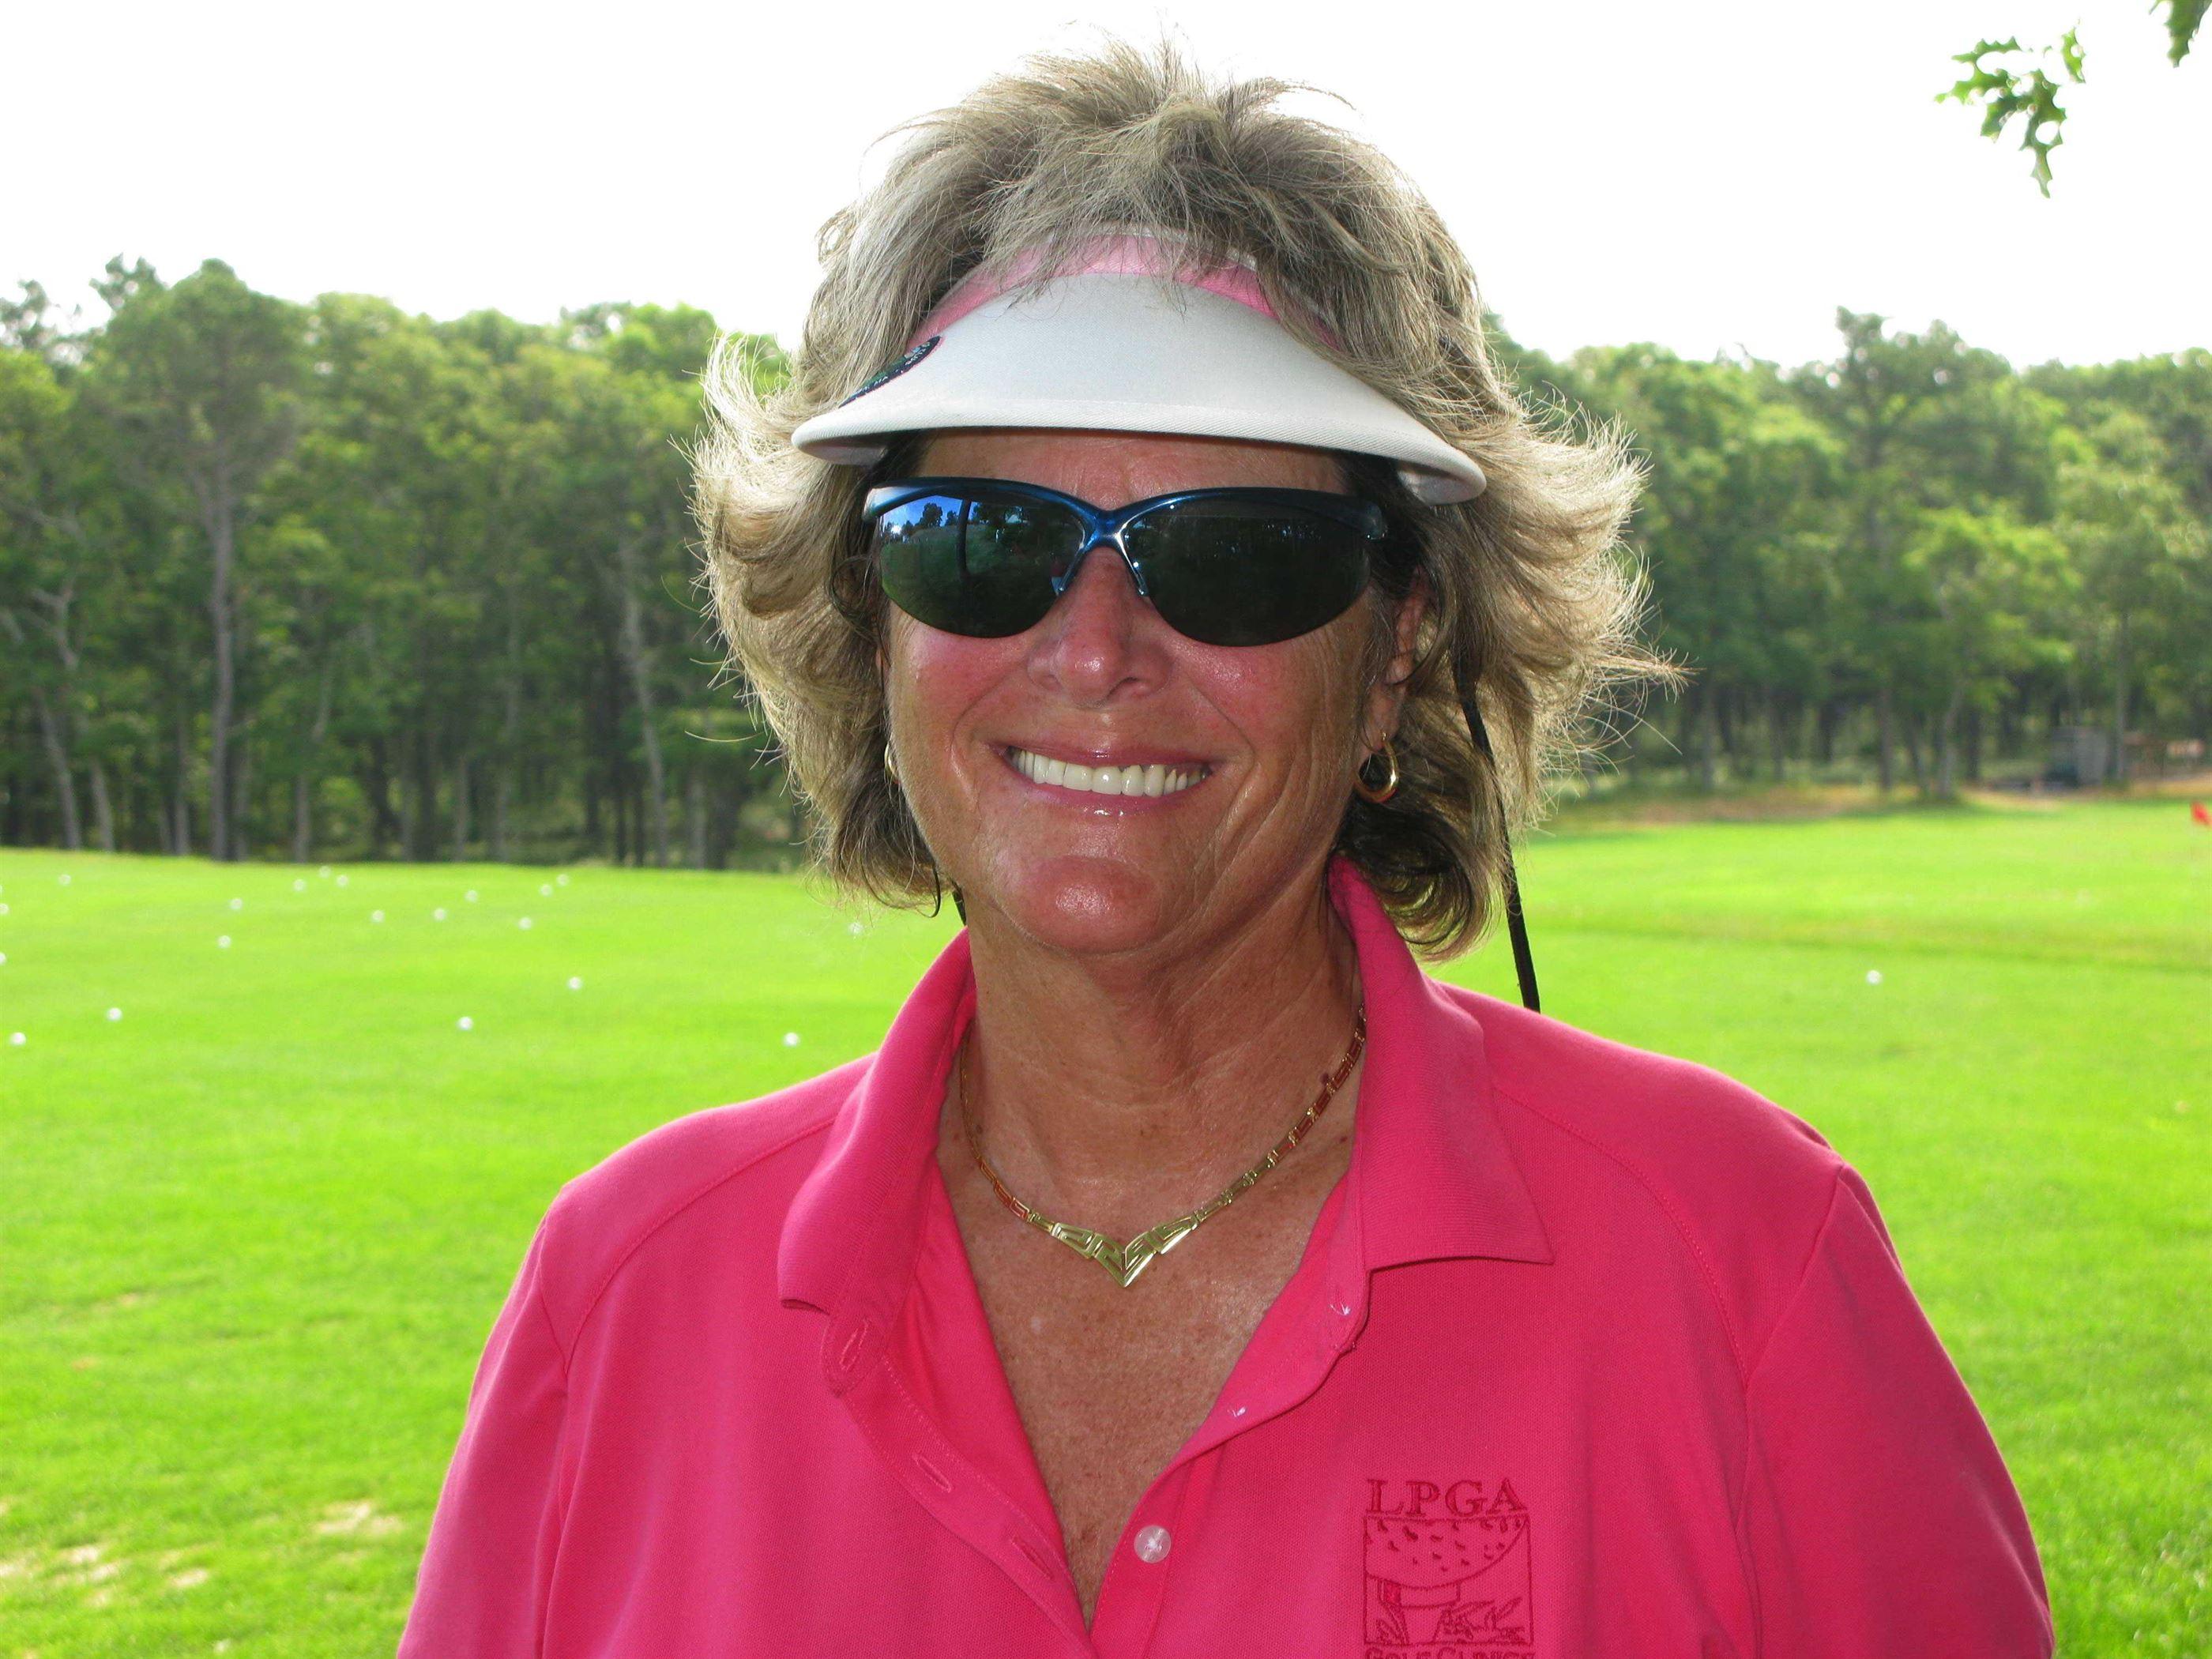 e5969175b73 Advice To Improve Your Golf Game  LPGA Pro Sue Kaffenburg Offers ...